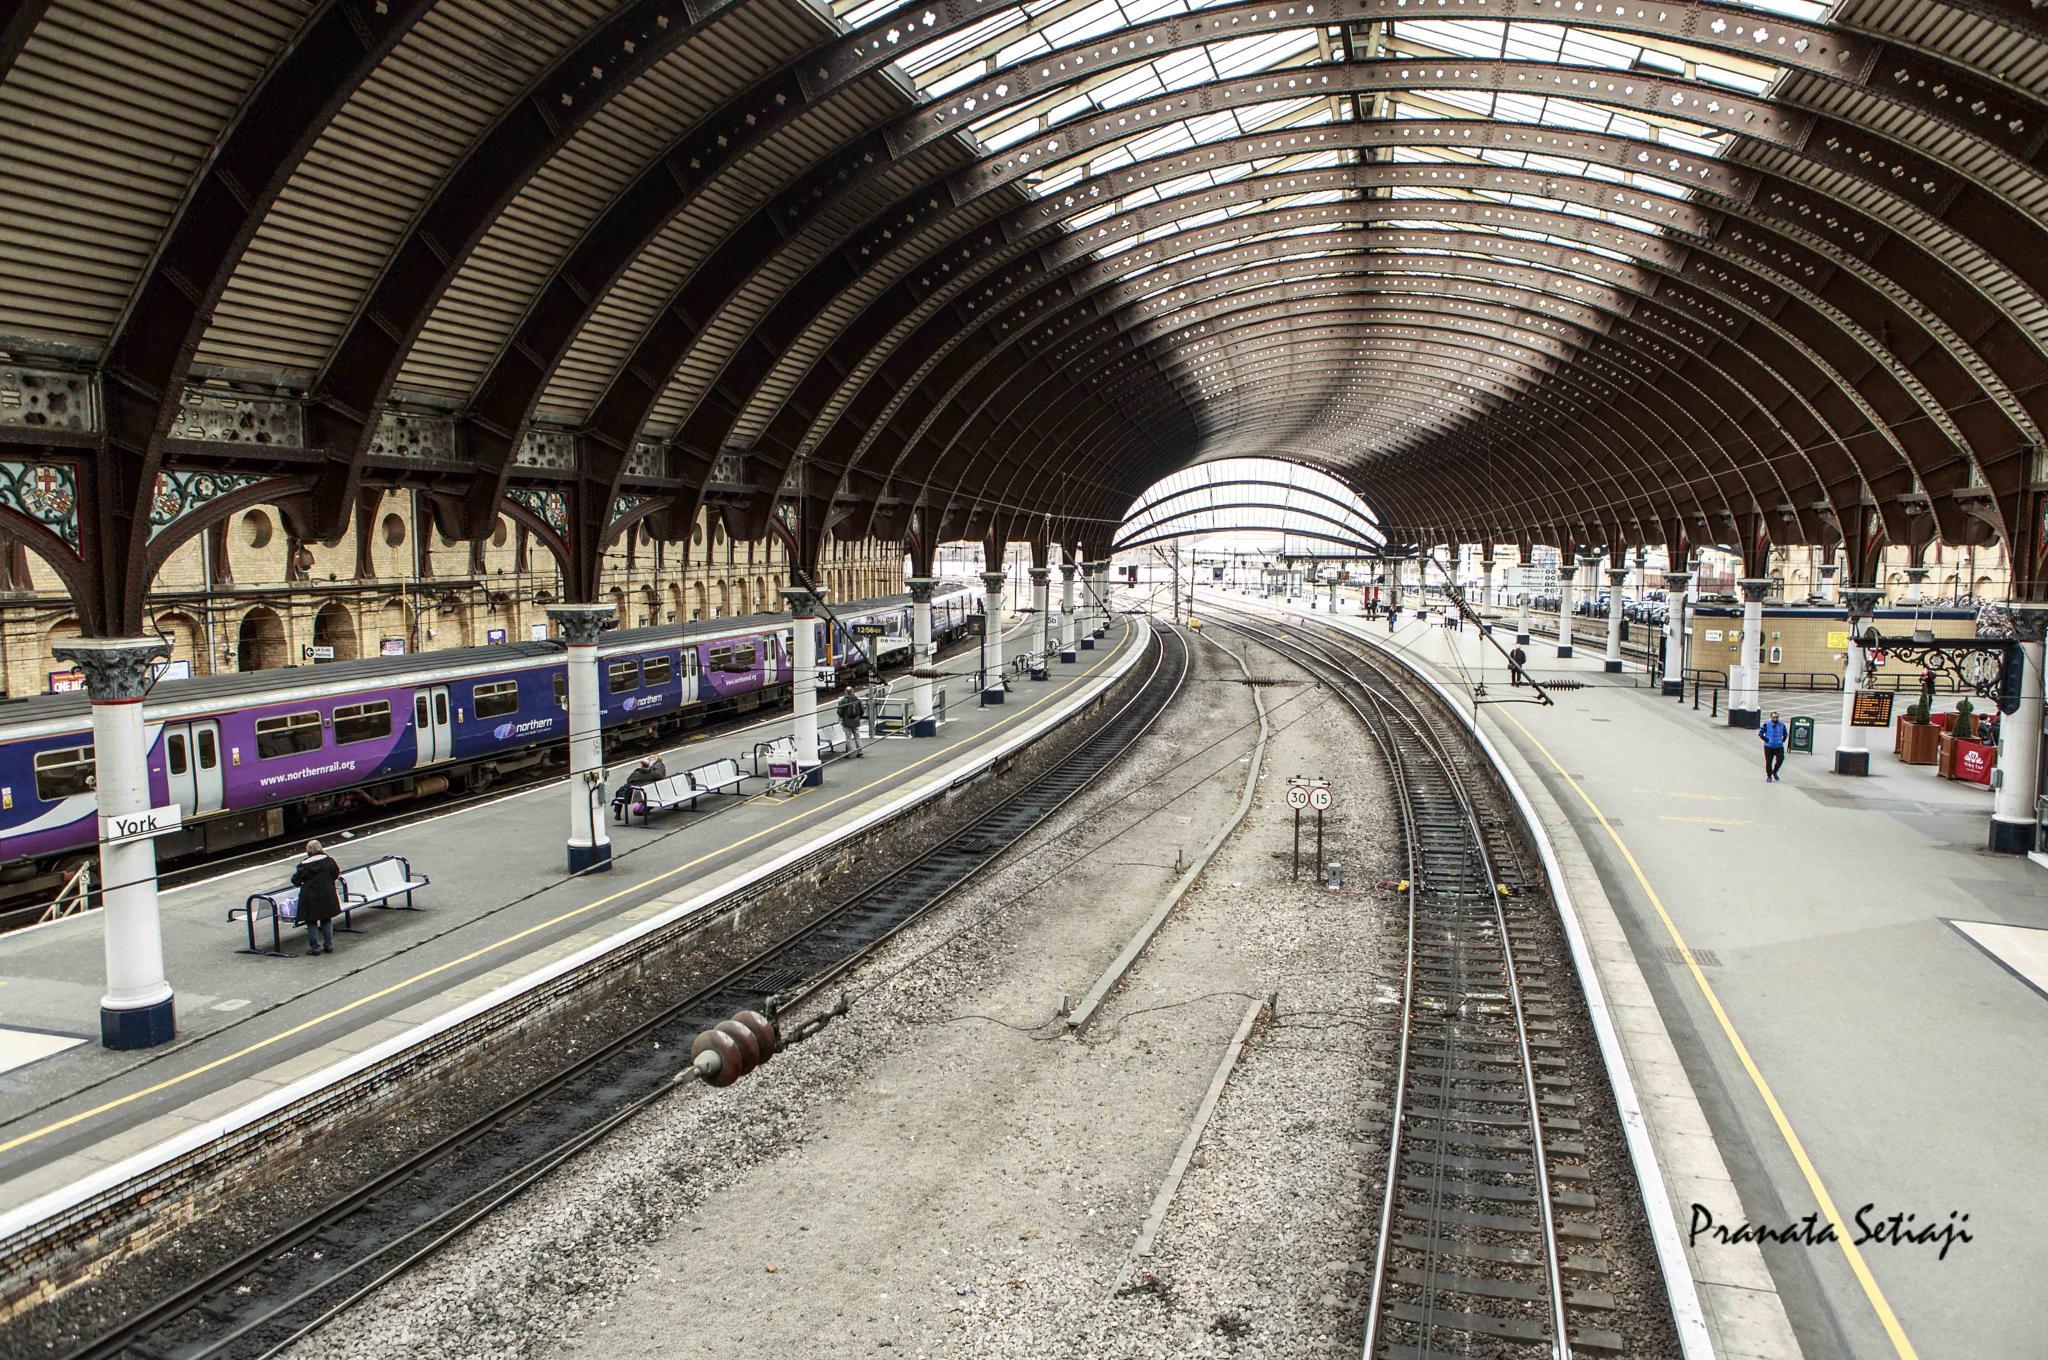 York rail station by pranata.setiaji